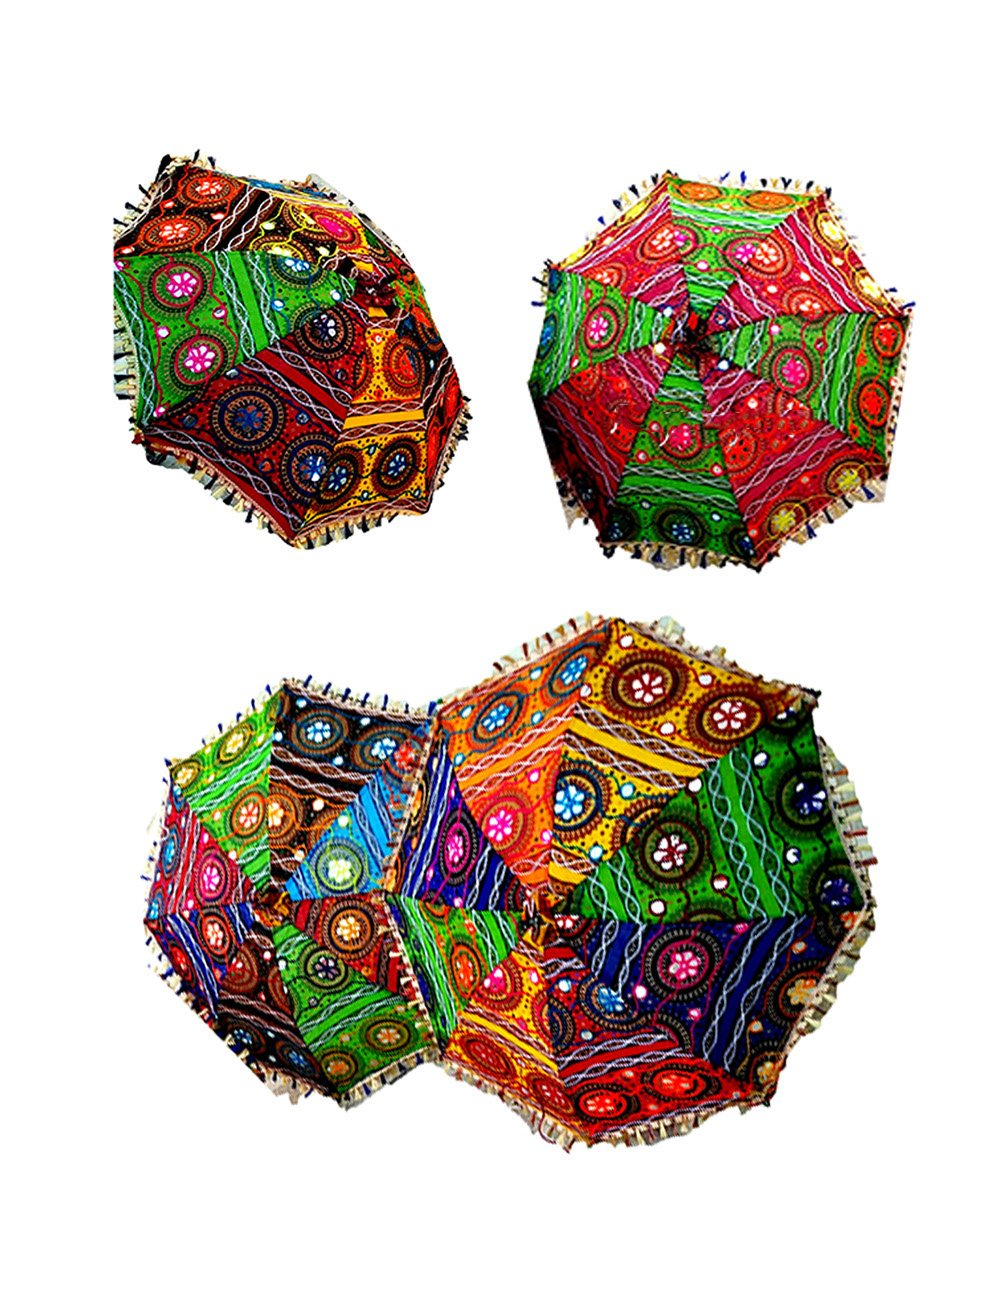 Wholesale Lot of 75 PC Traditional Indian Designer Handmade Rajasthani Umbrella